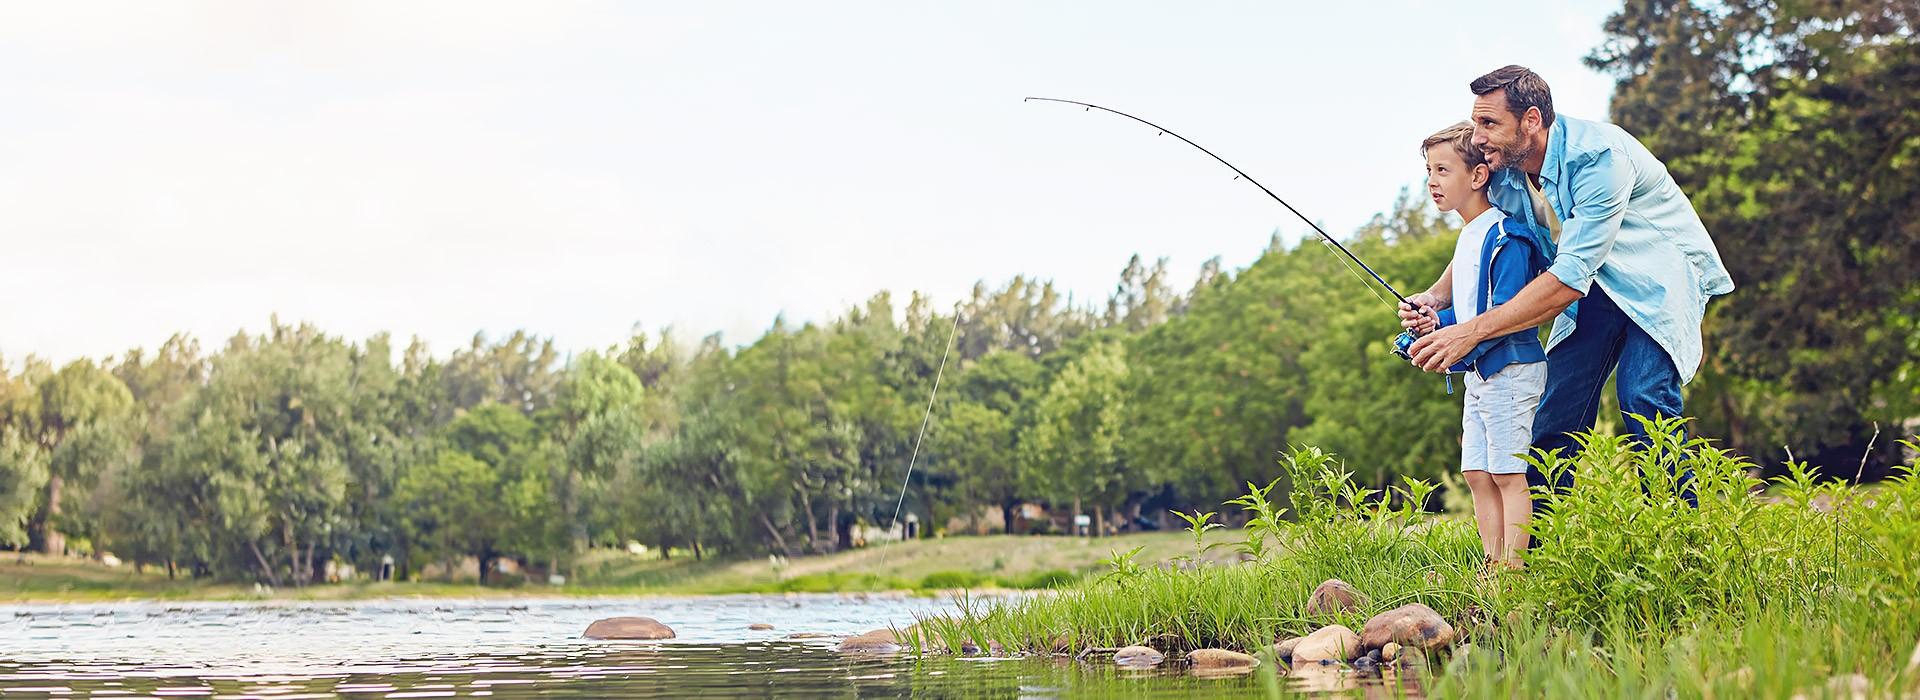 Nunca olvides tu primera captura99,99 €Deeper START Fishfinder